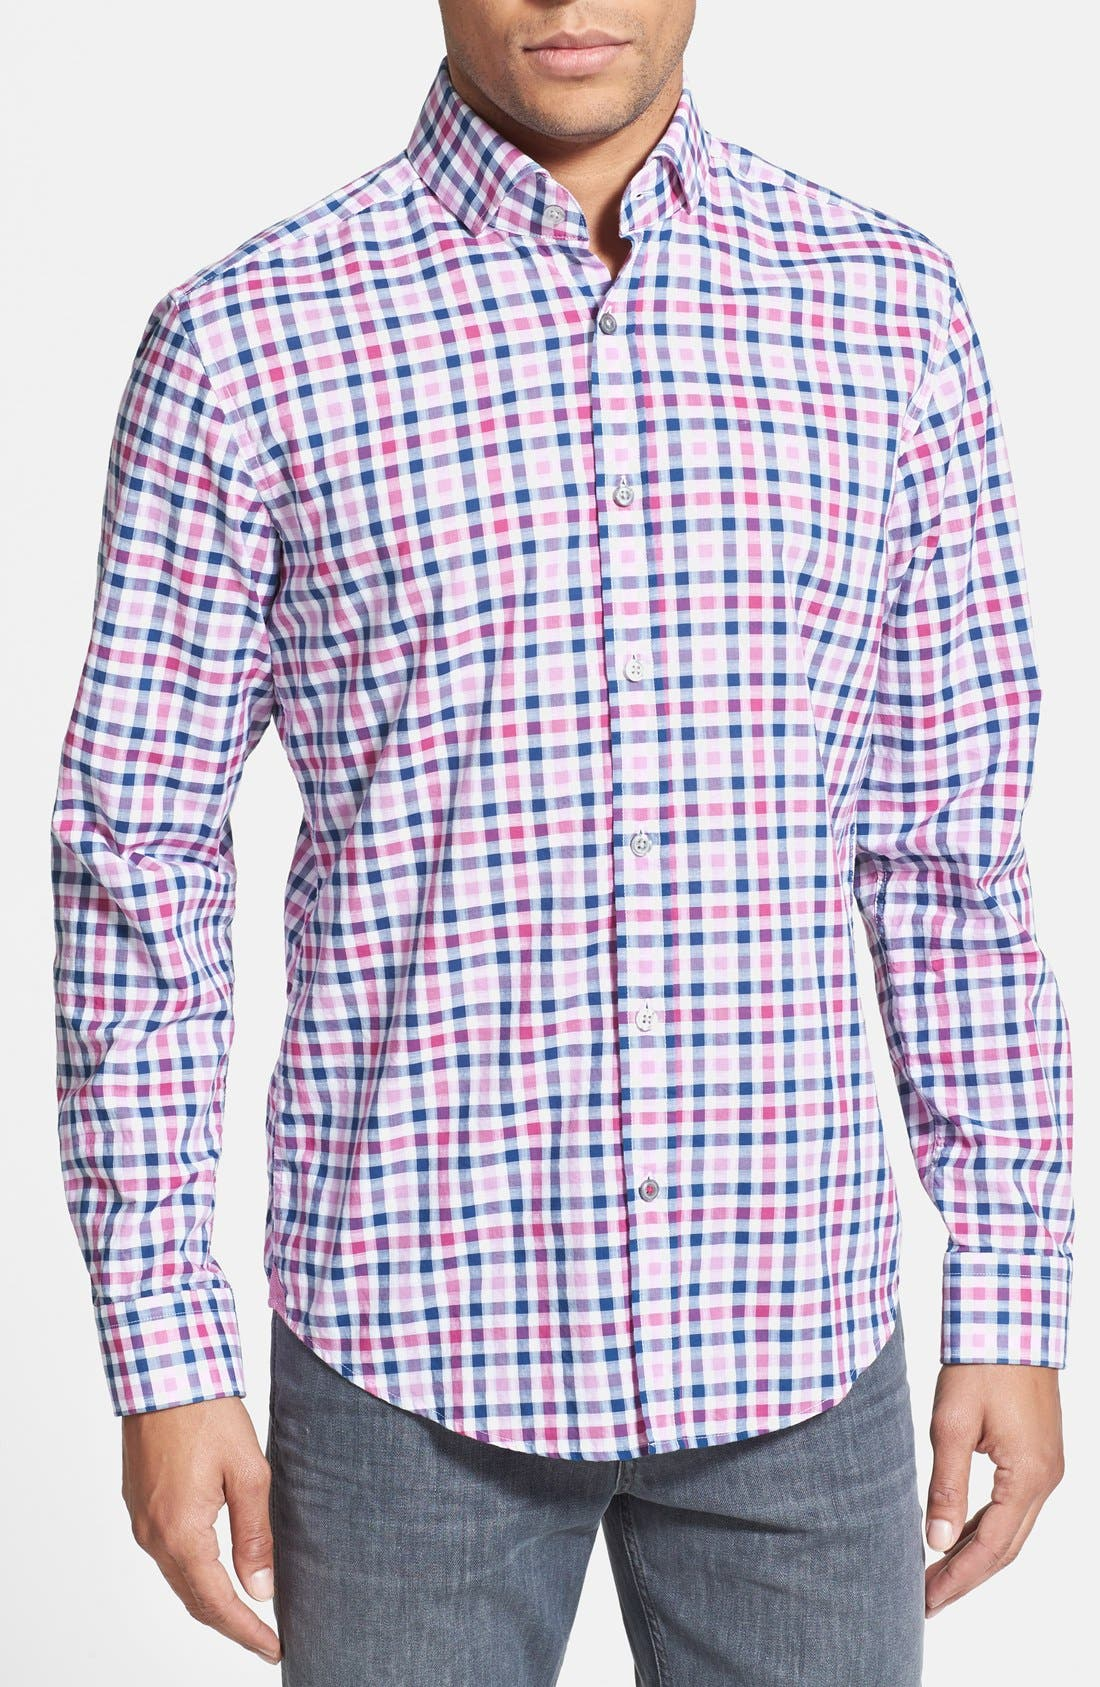 Main Image - BOSS HUGO BOSS 'Mason' Slim Fit Gingham Sport Shirt